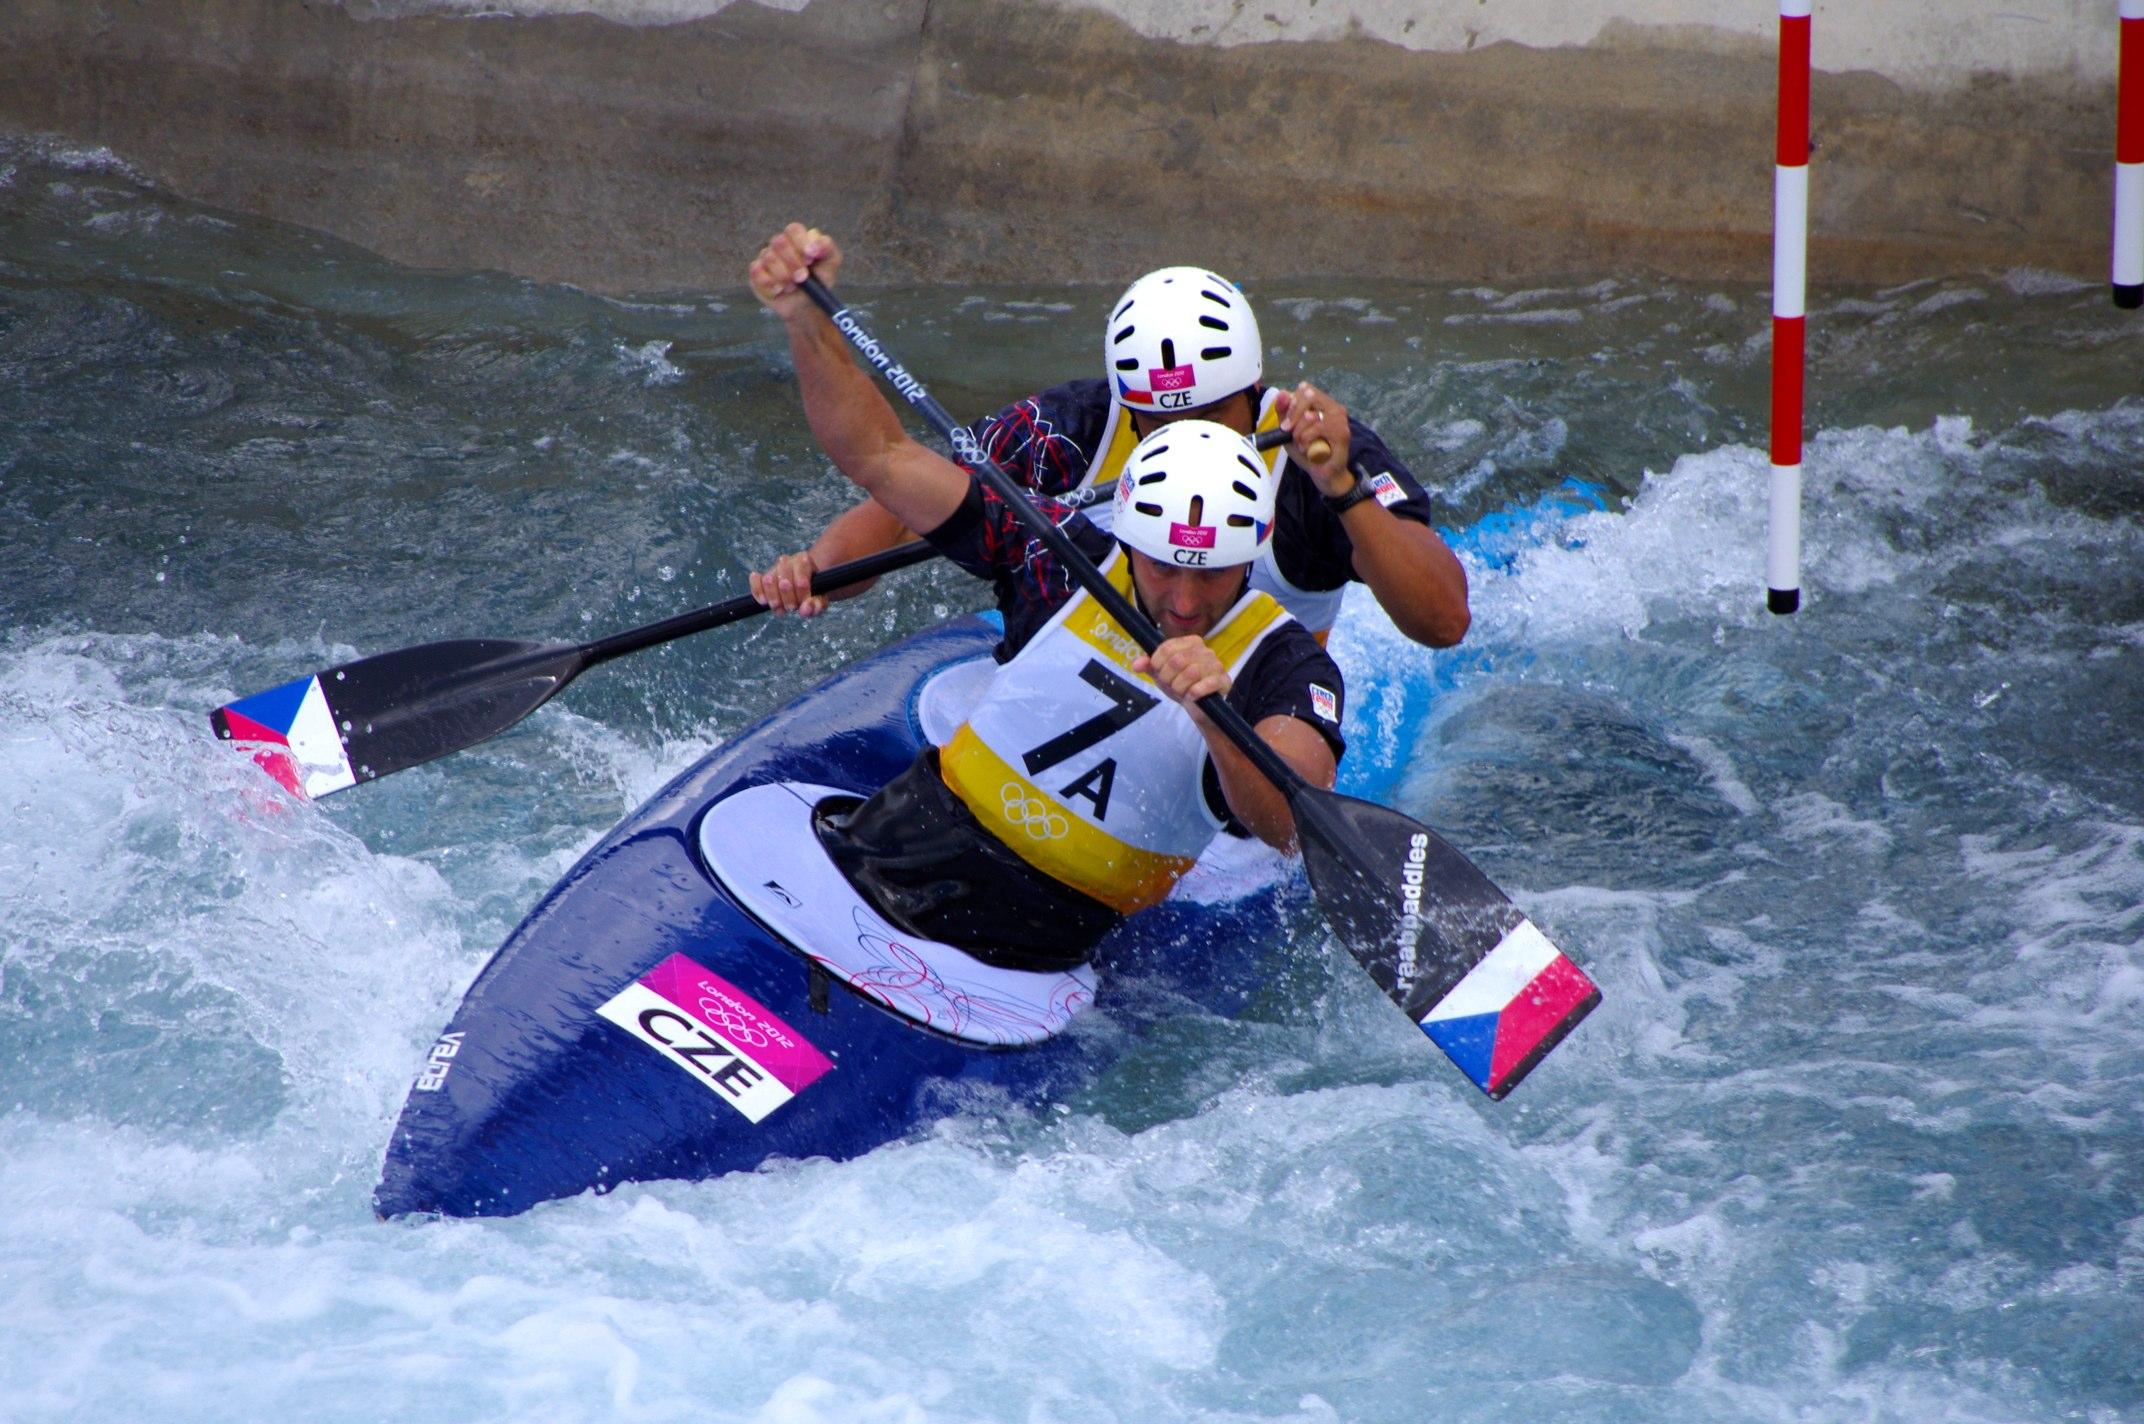 FileSlalom Canoeing 2012 Olympics C2 CZE Jaroslav Volf And Ondrej Stepanek